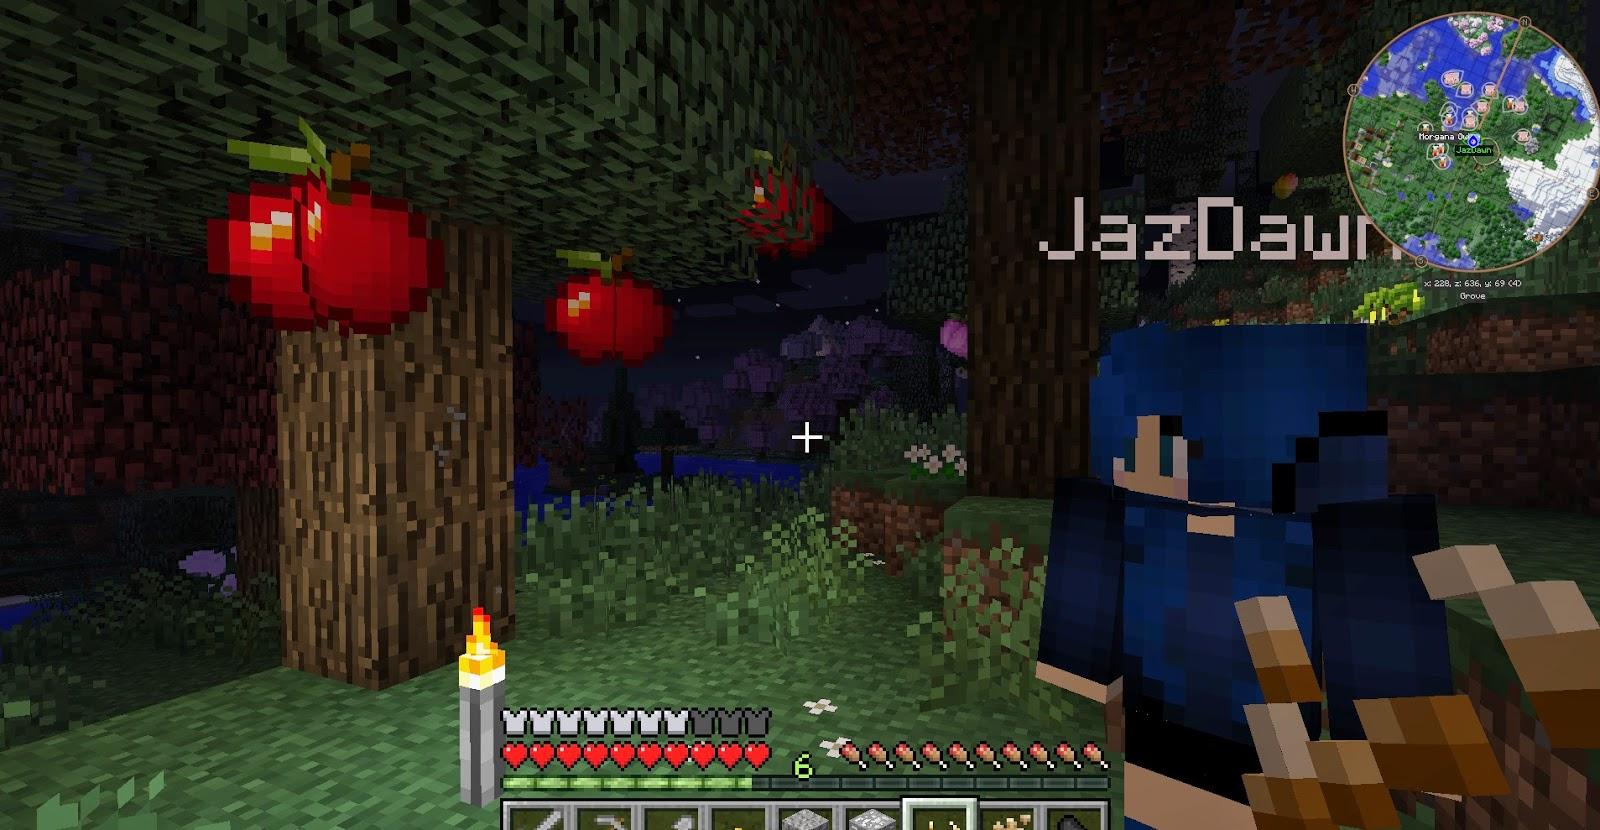 Second Life Newser: Back in FTB Minecraft Again